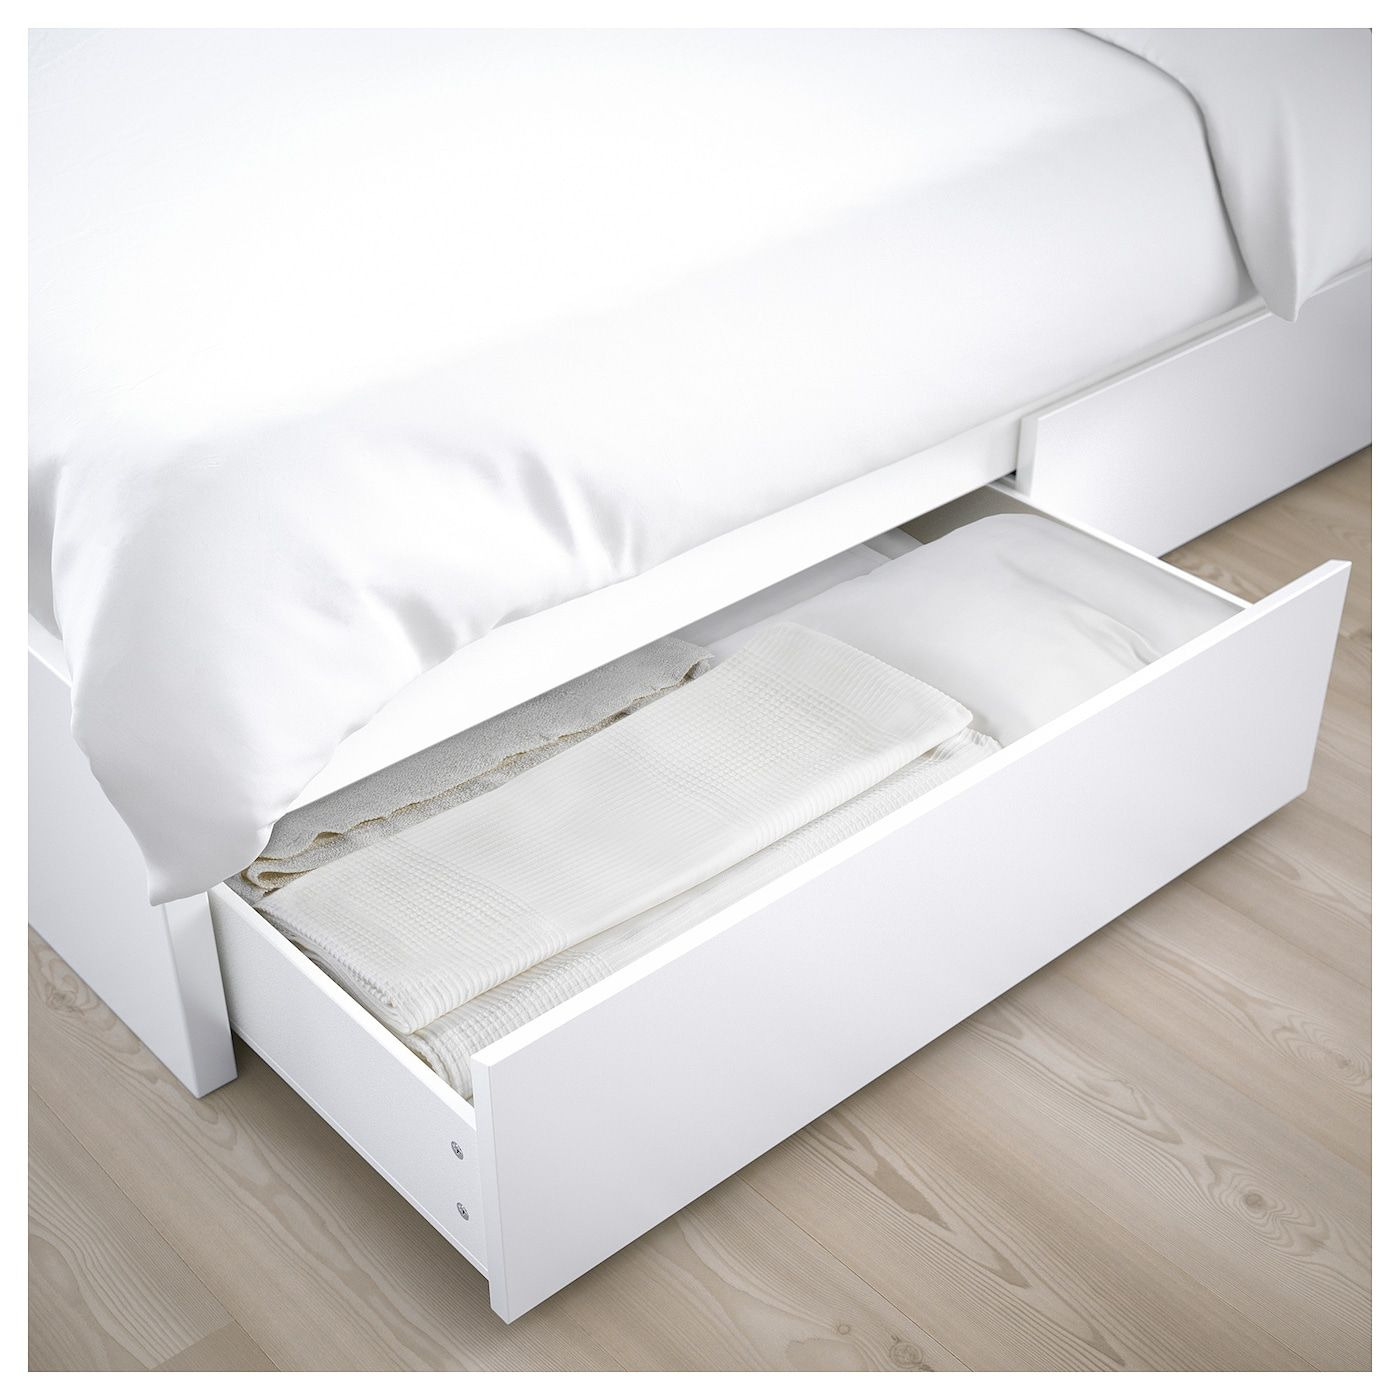 Malm Bedframe Hoog Met 4 Bedlades Wit Leirsund 160x200 Cm Ikea Malm Bed Frame High Bed Frame Malm Bed